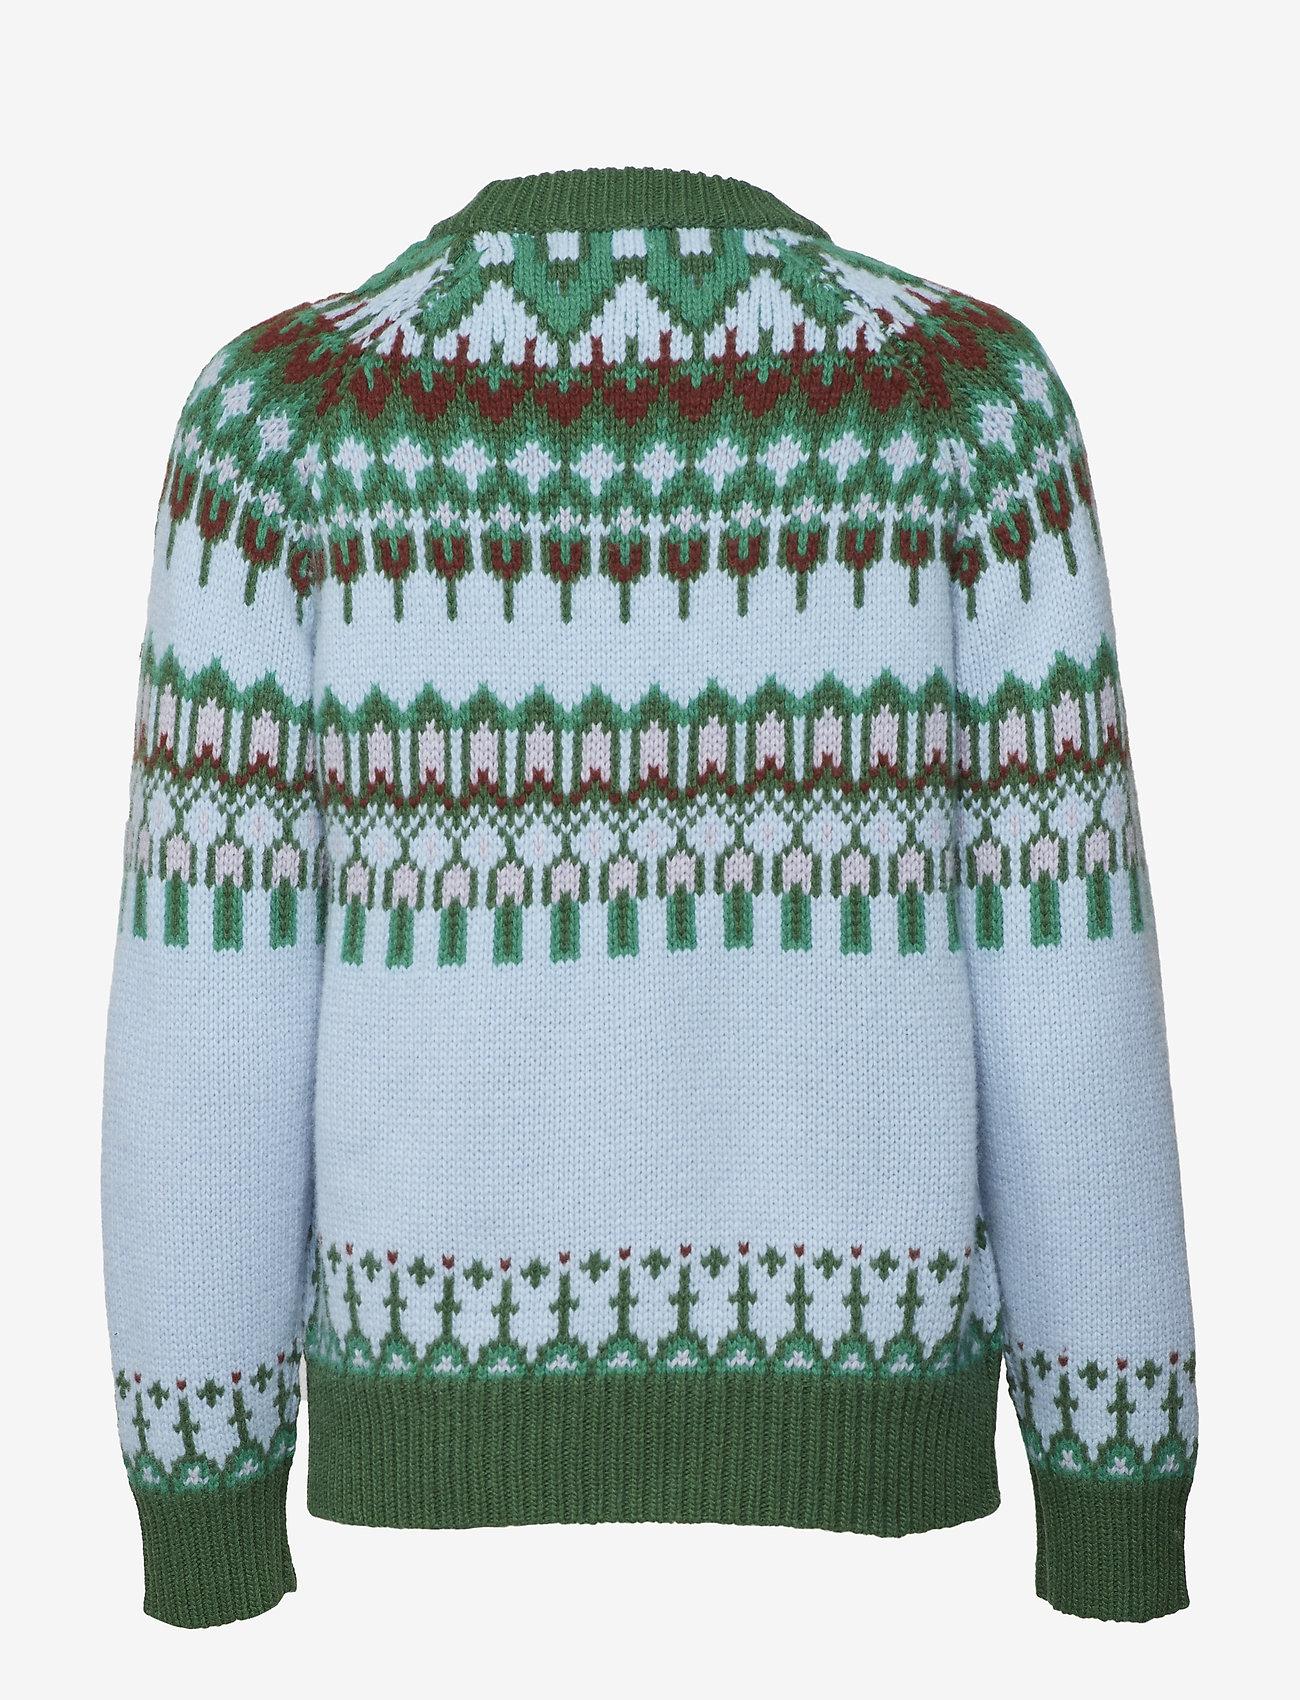 Bonfire Sweater  - Cathrine Hammel